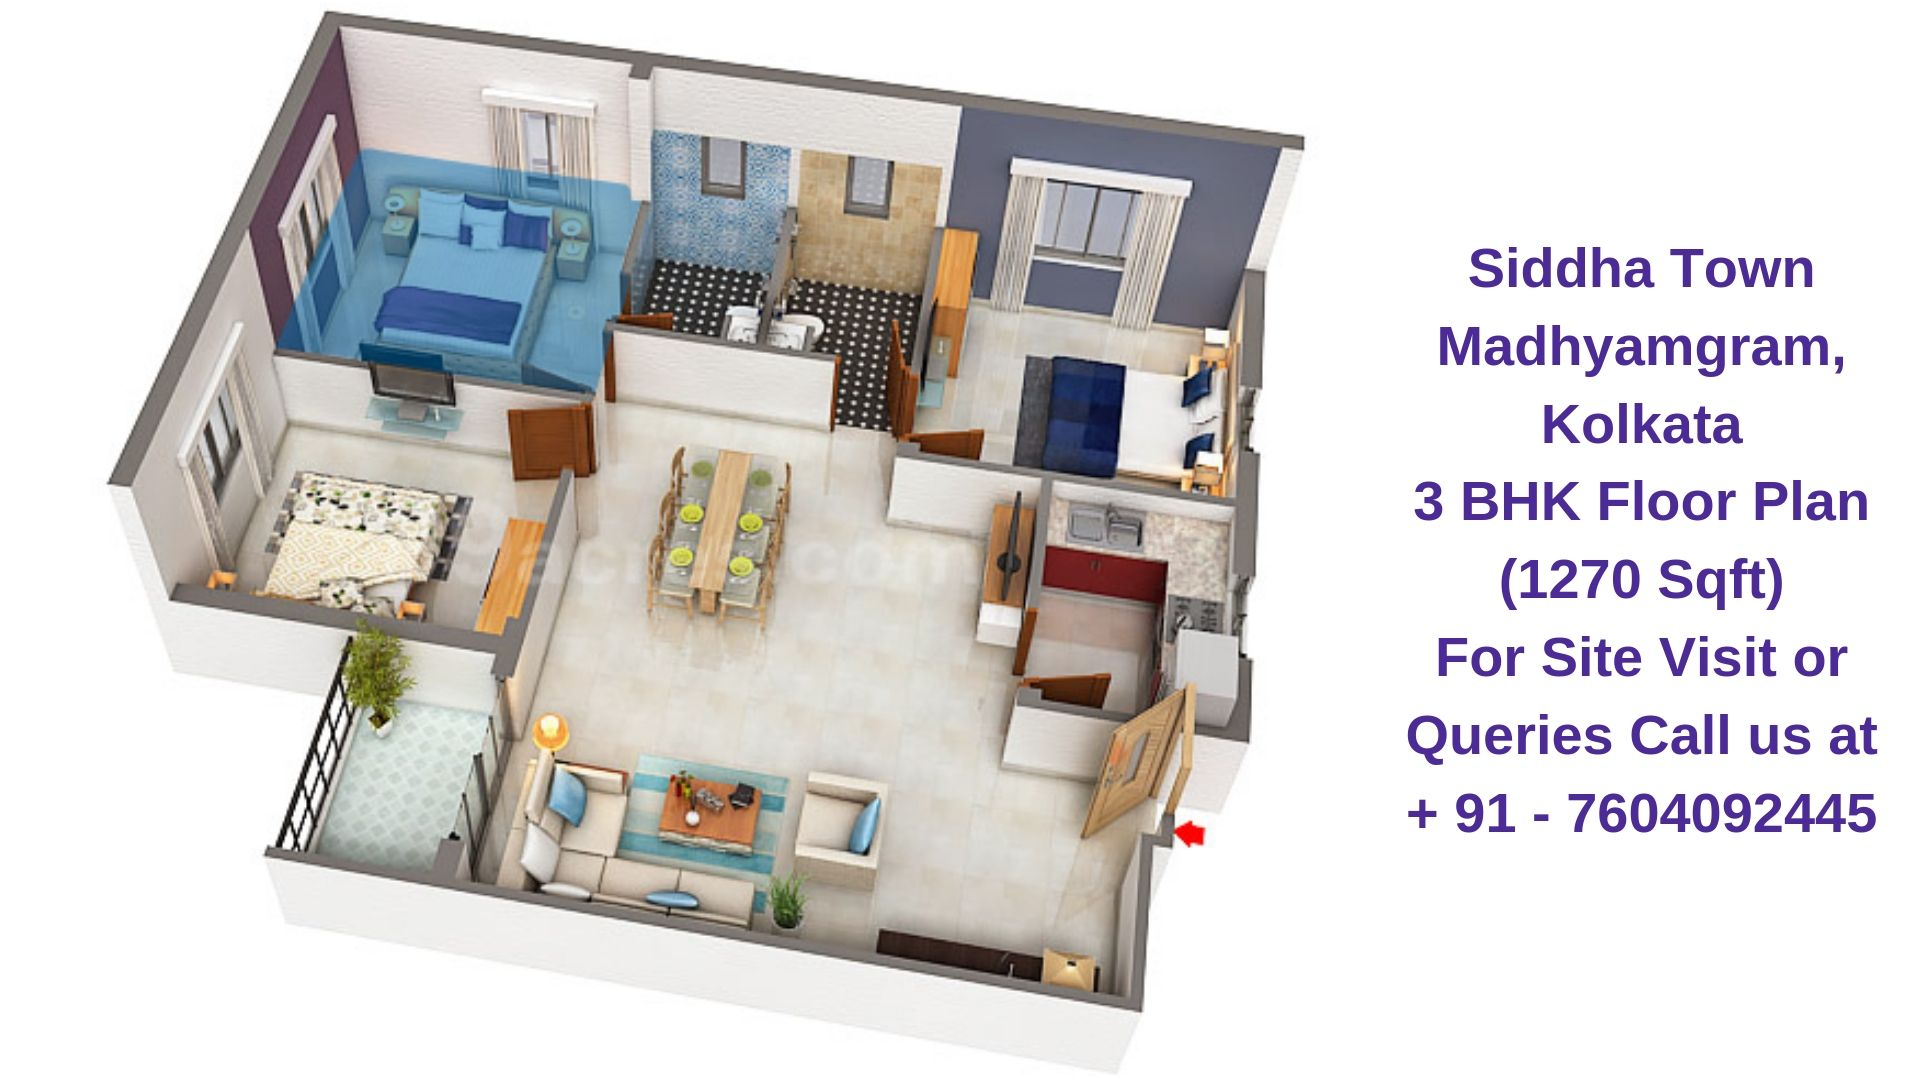 Siddha Town Madhyamgram, Kolkata 3 BHK Floor Plan 1270 Sqft